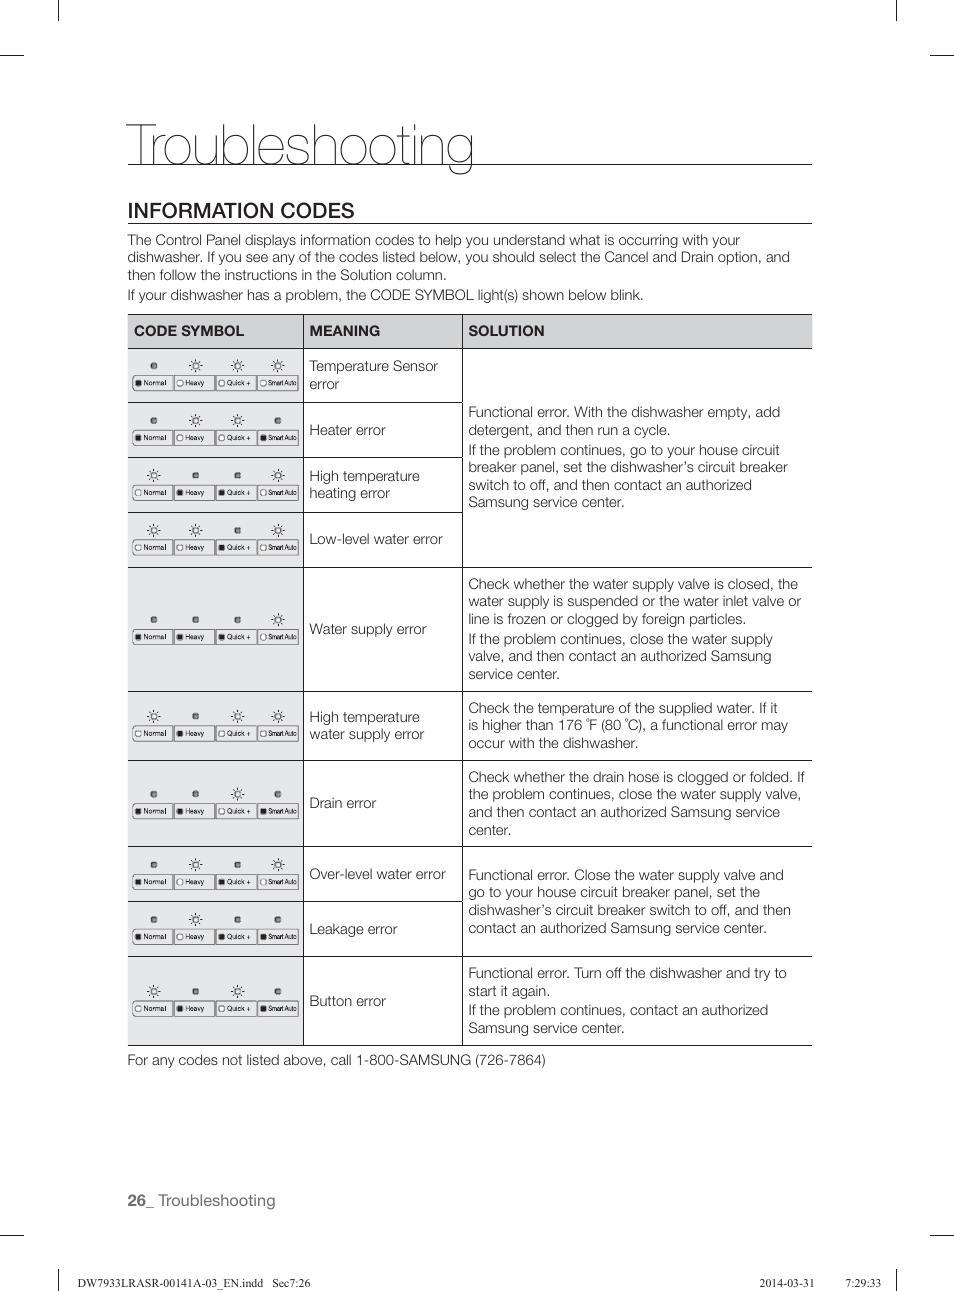 Samsung Dishwasher Normal Light Flashing : samsung, dishwasher, normal, light, flashing, Troubleshooting,, Information, Codes, Samsung, DW7933LRABB-AC, Manual